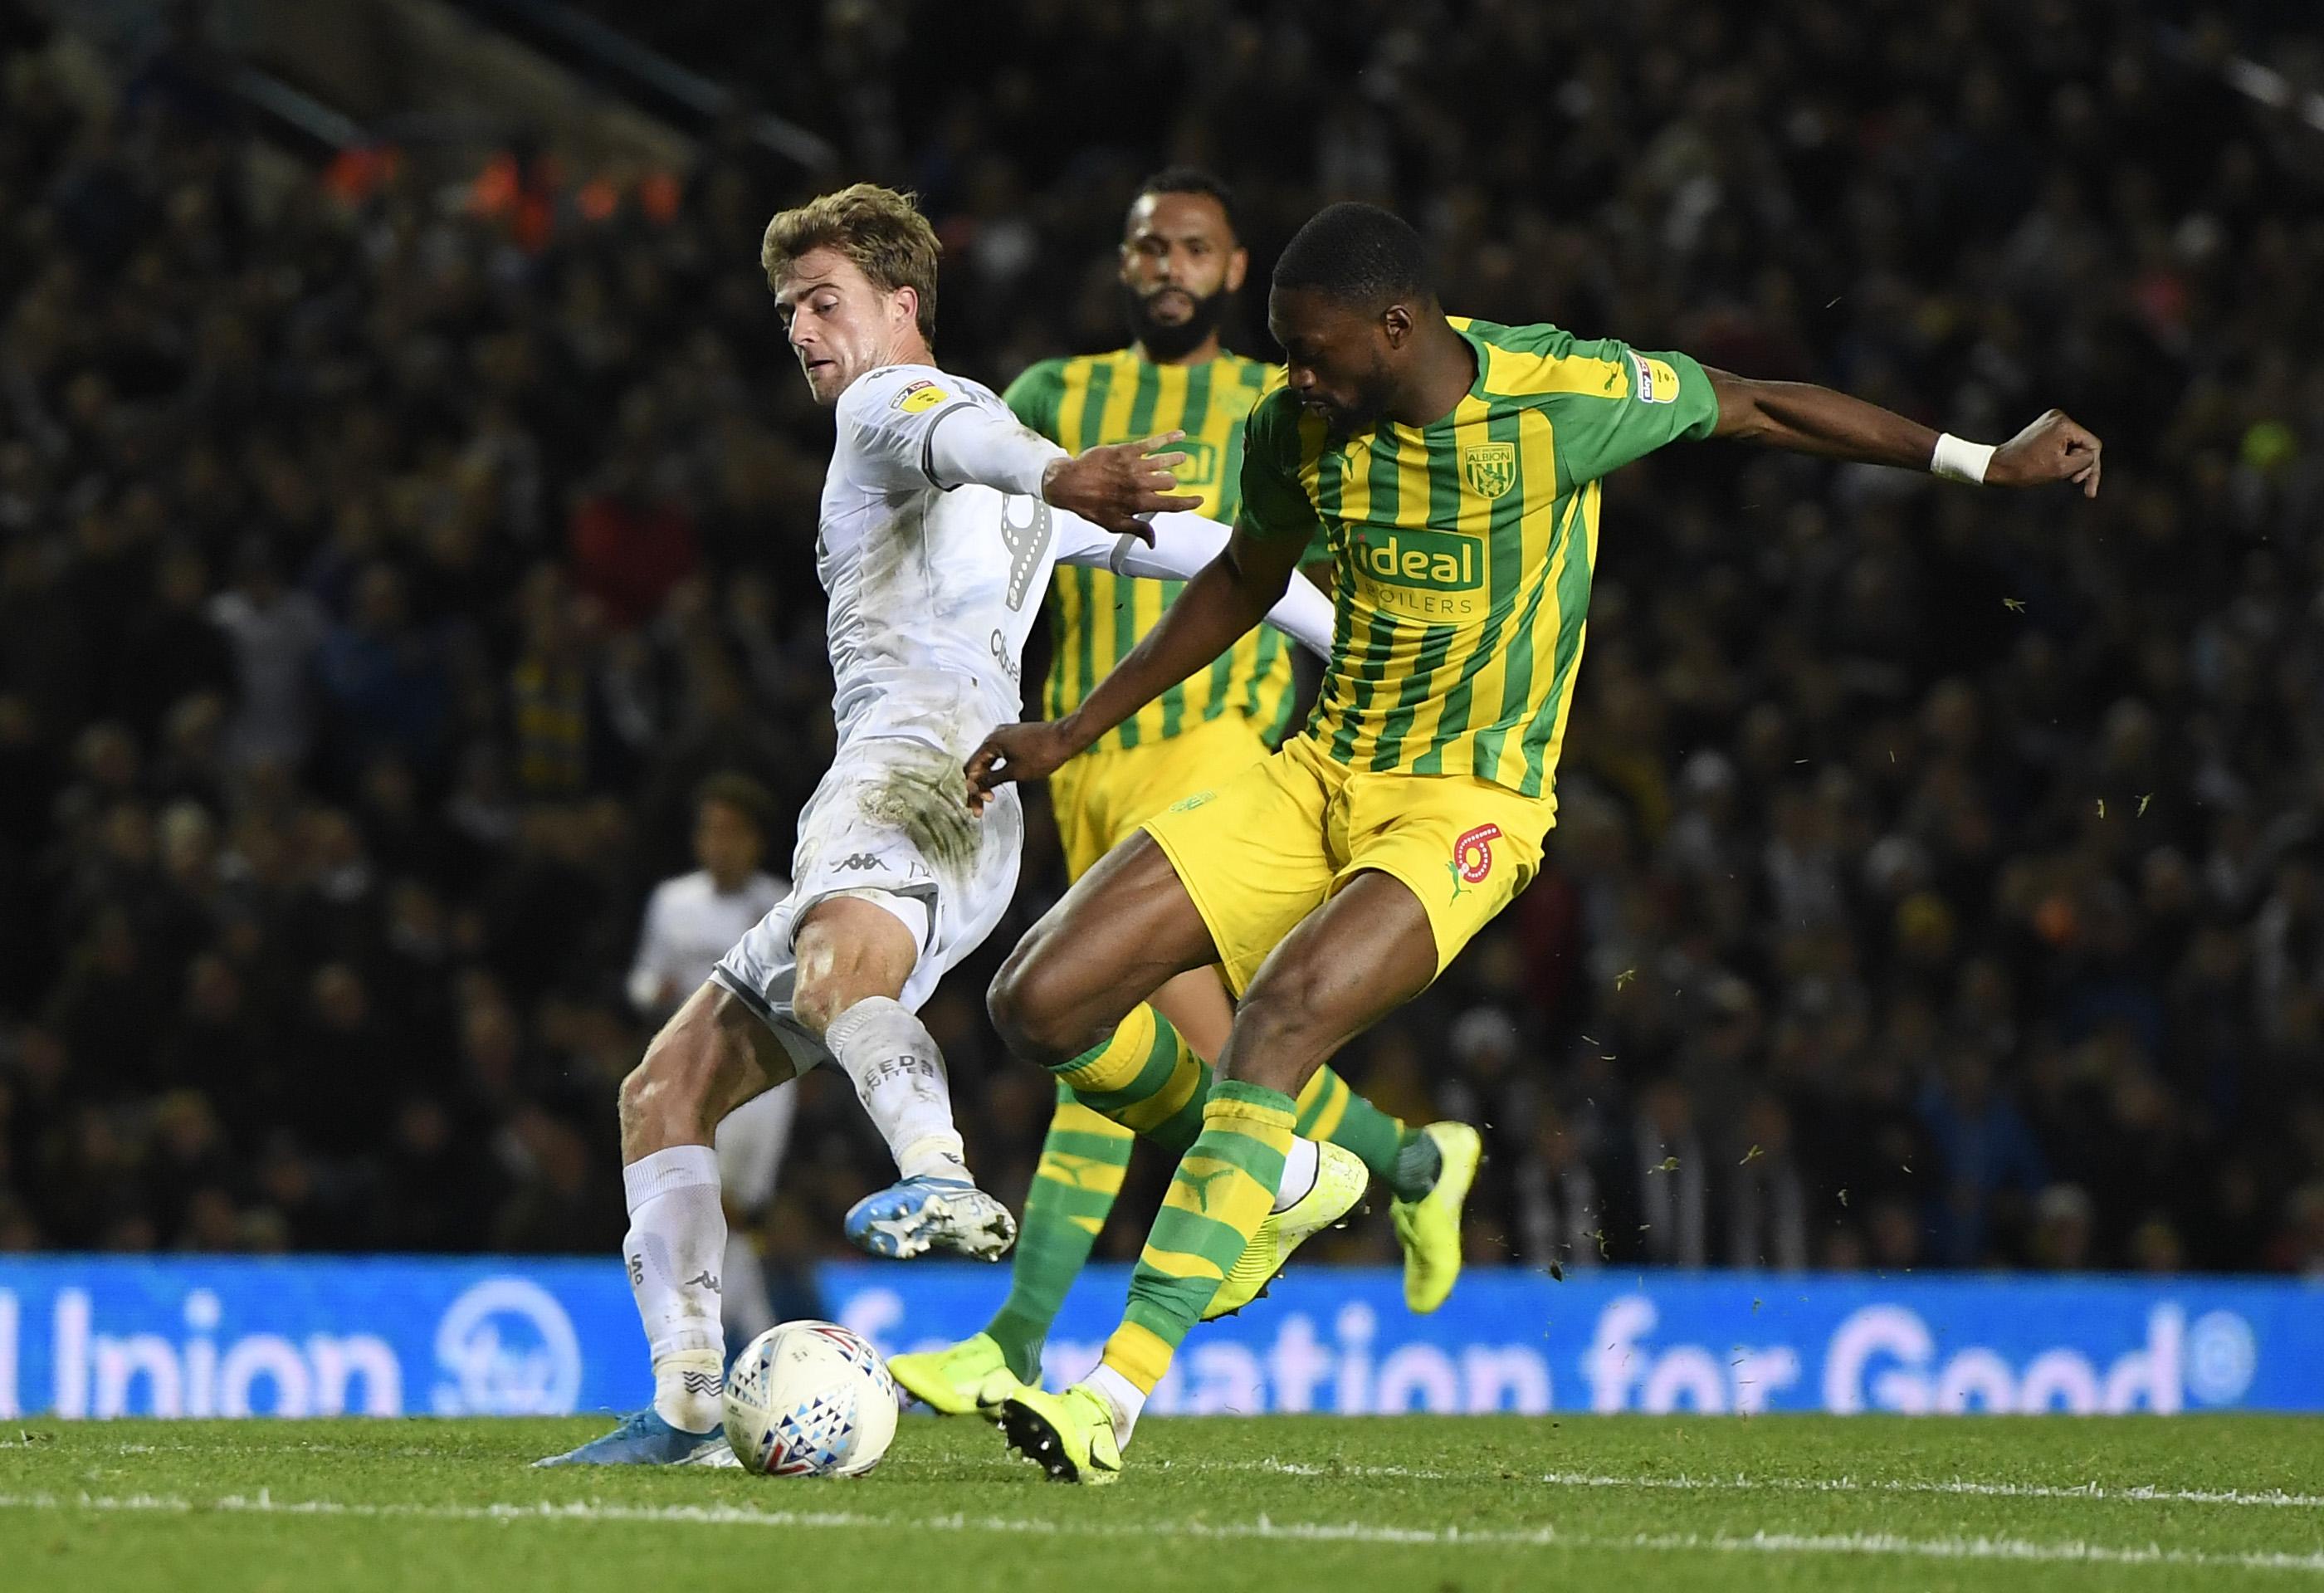 Leeds United v West Bromwich Albion - Sky Bet Championship